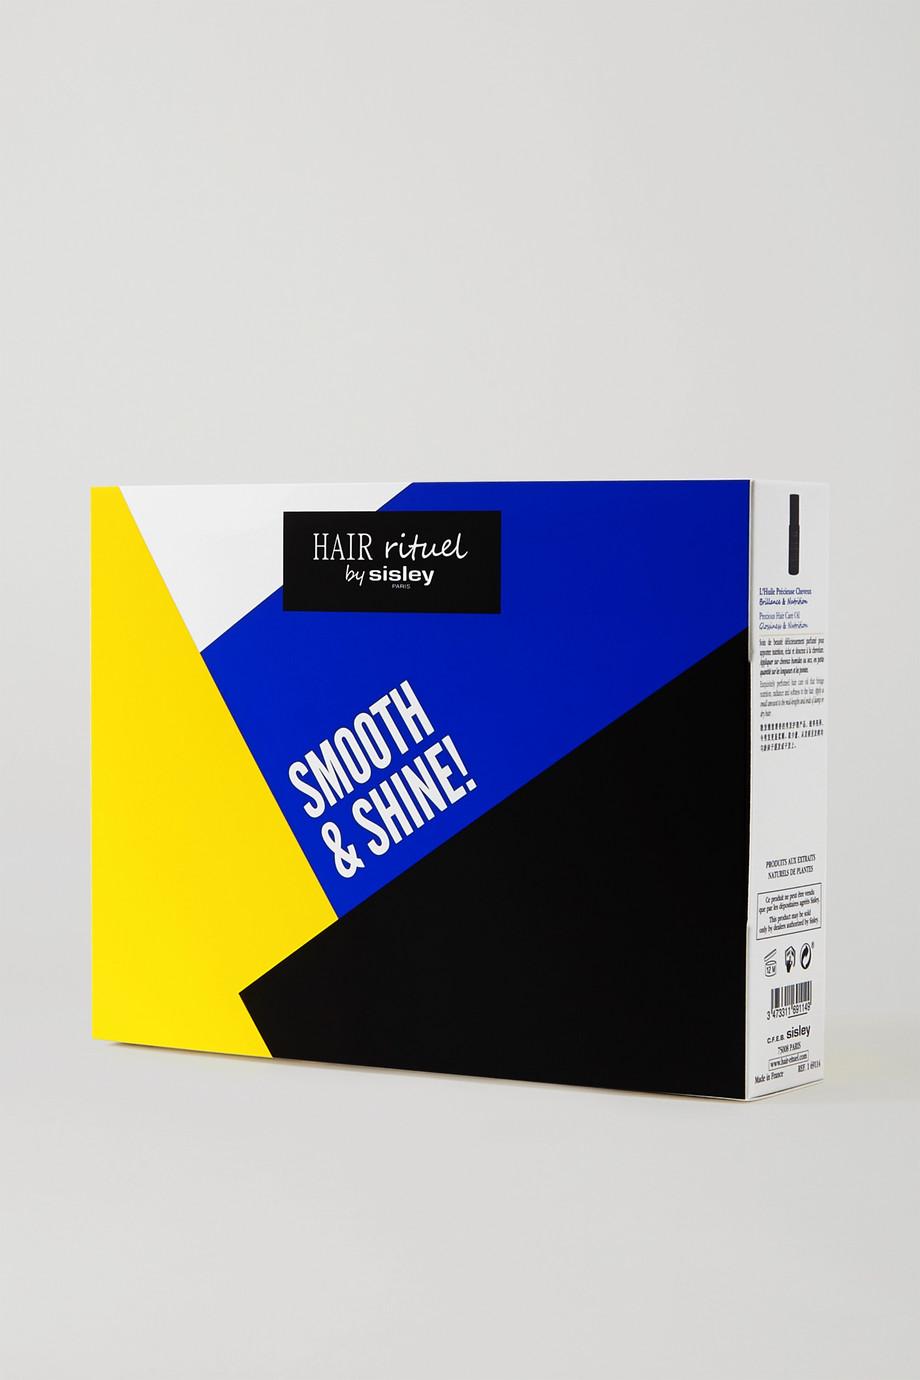 HAIR rituel by Sisley Smooth & Shine Kit – Haarpflegeset